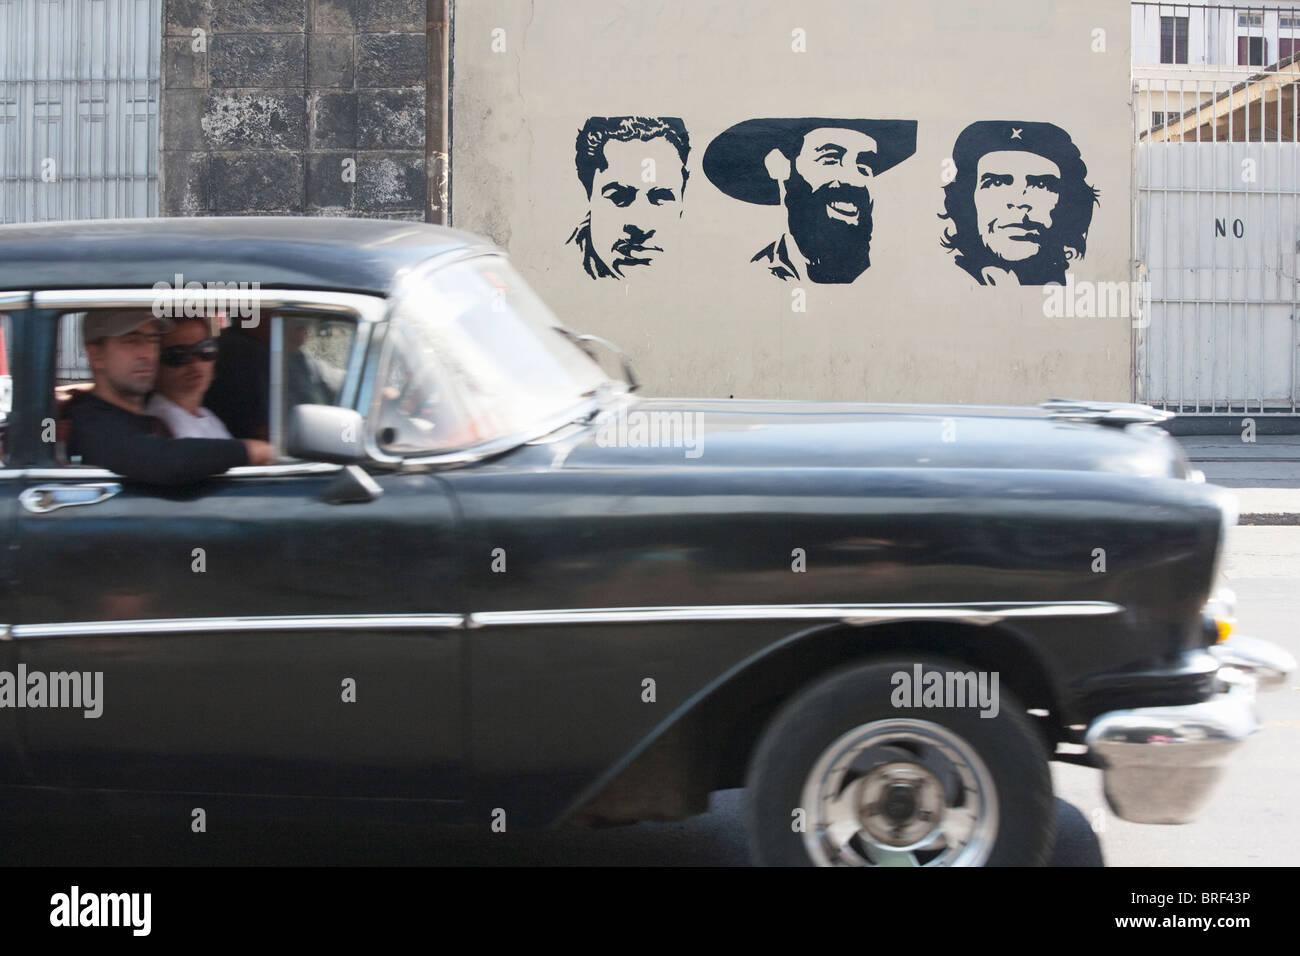 HAVANA: COMMUNIST GRAFFITI AND VINTAGE CAR Stock Photo